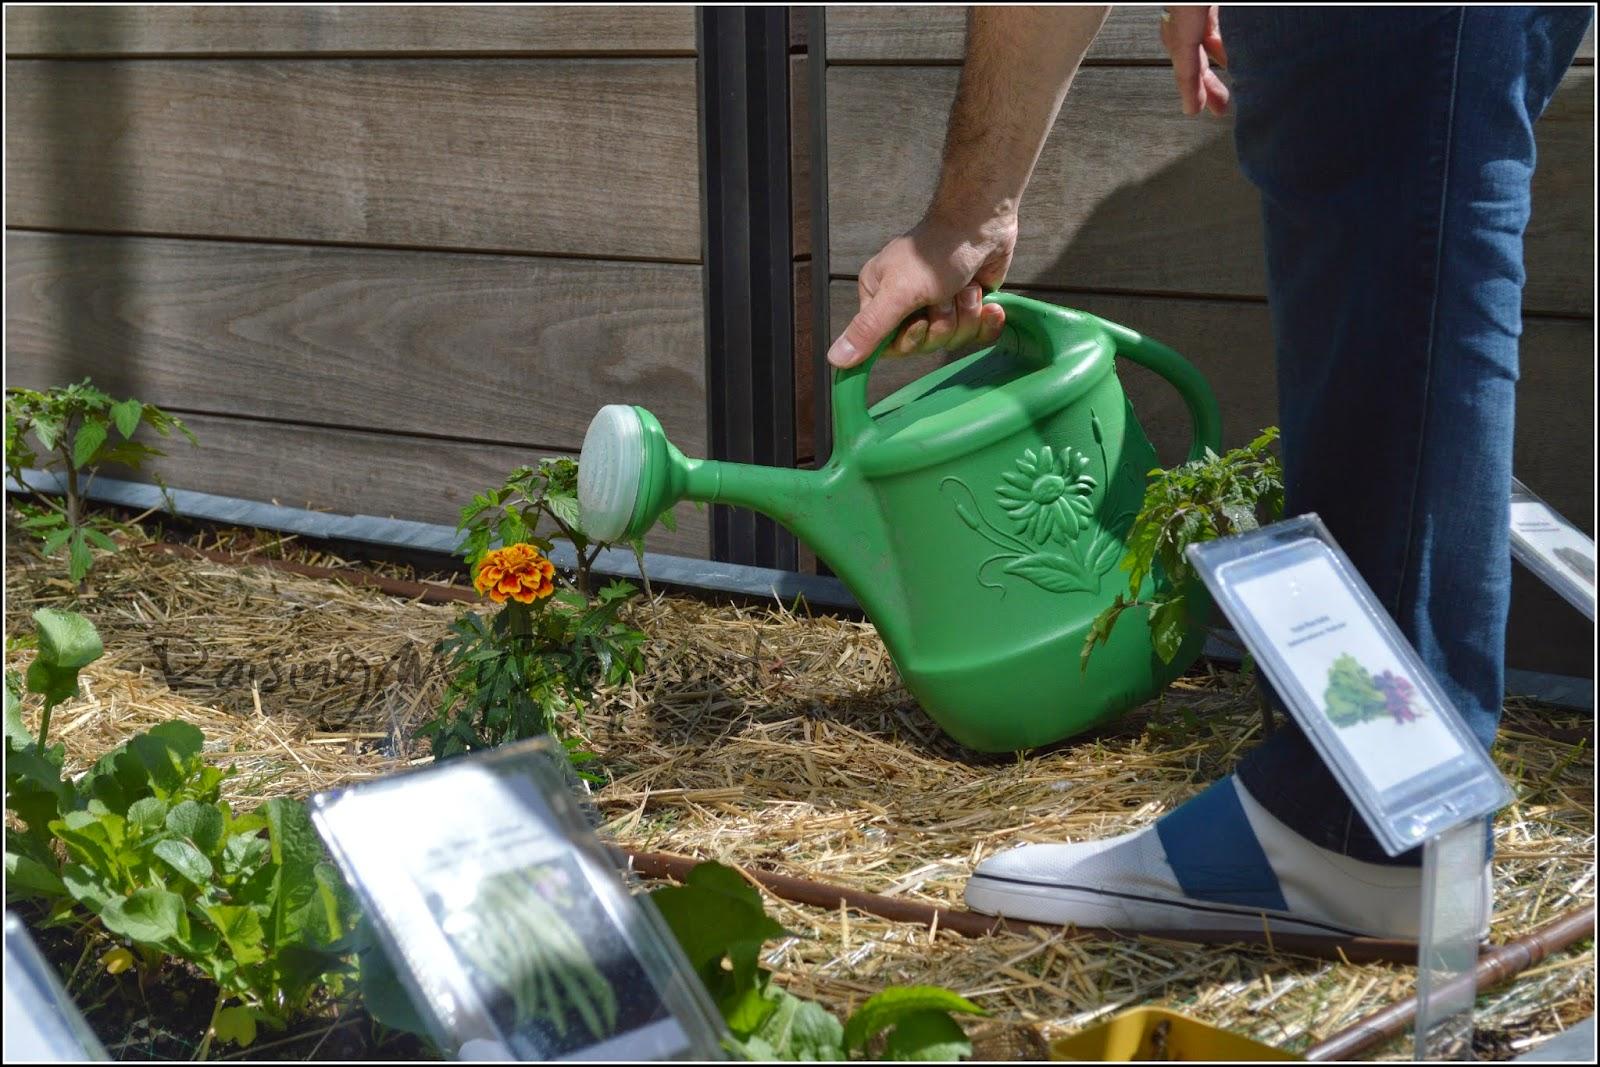 TELUS Green Team watering garden